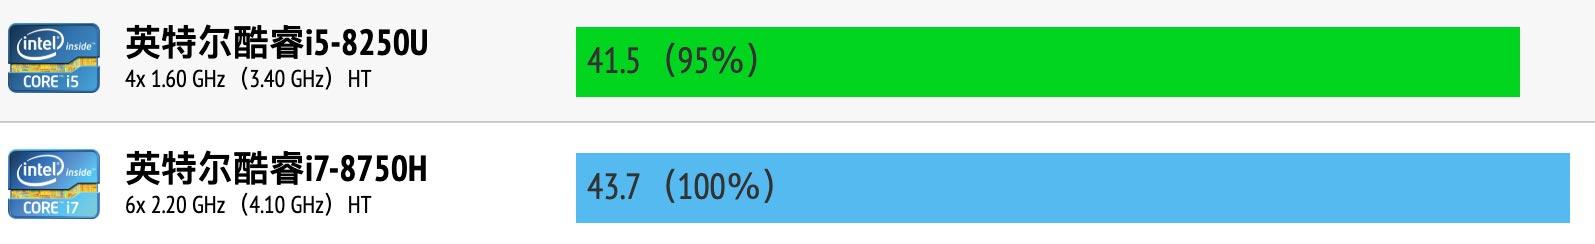 Intel Core i5-8250U和i7-8750H性能跑分对比评测